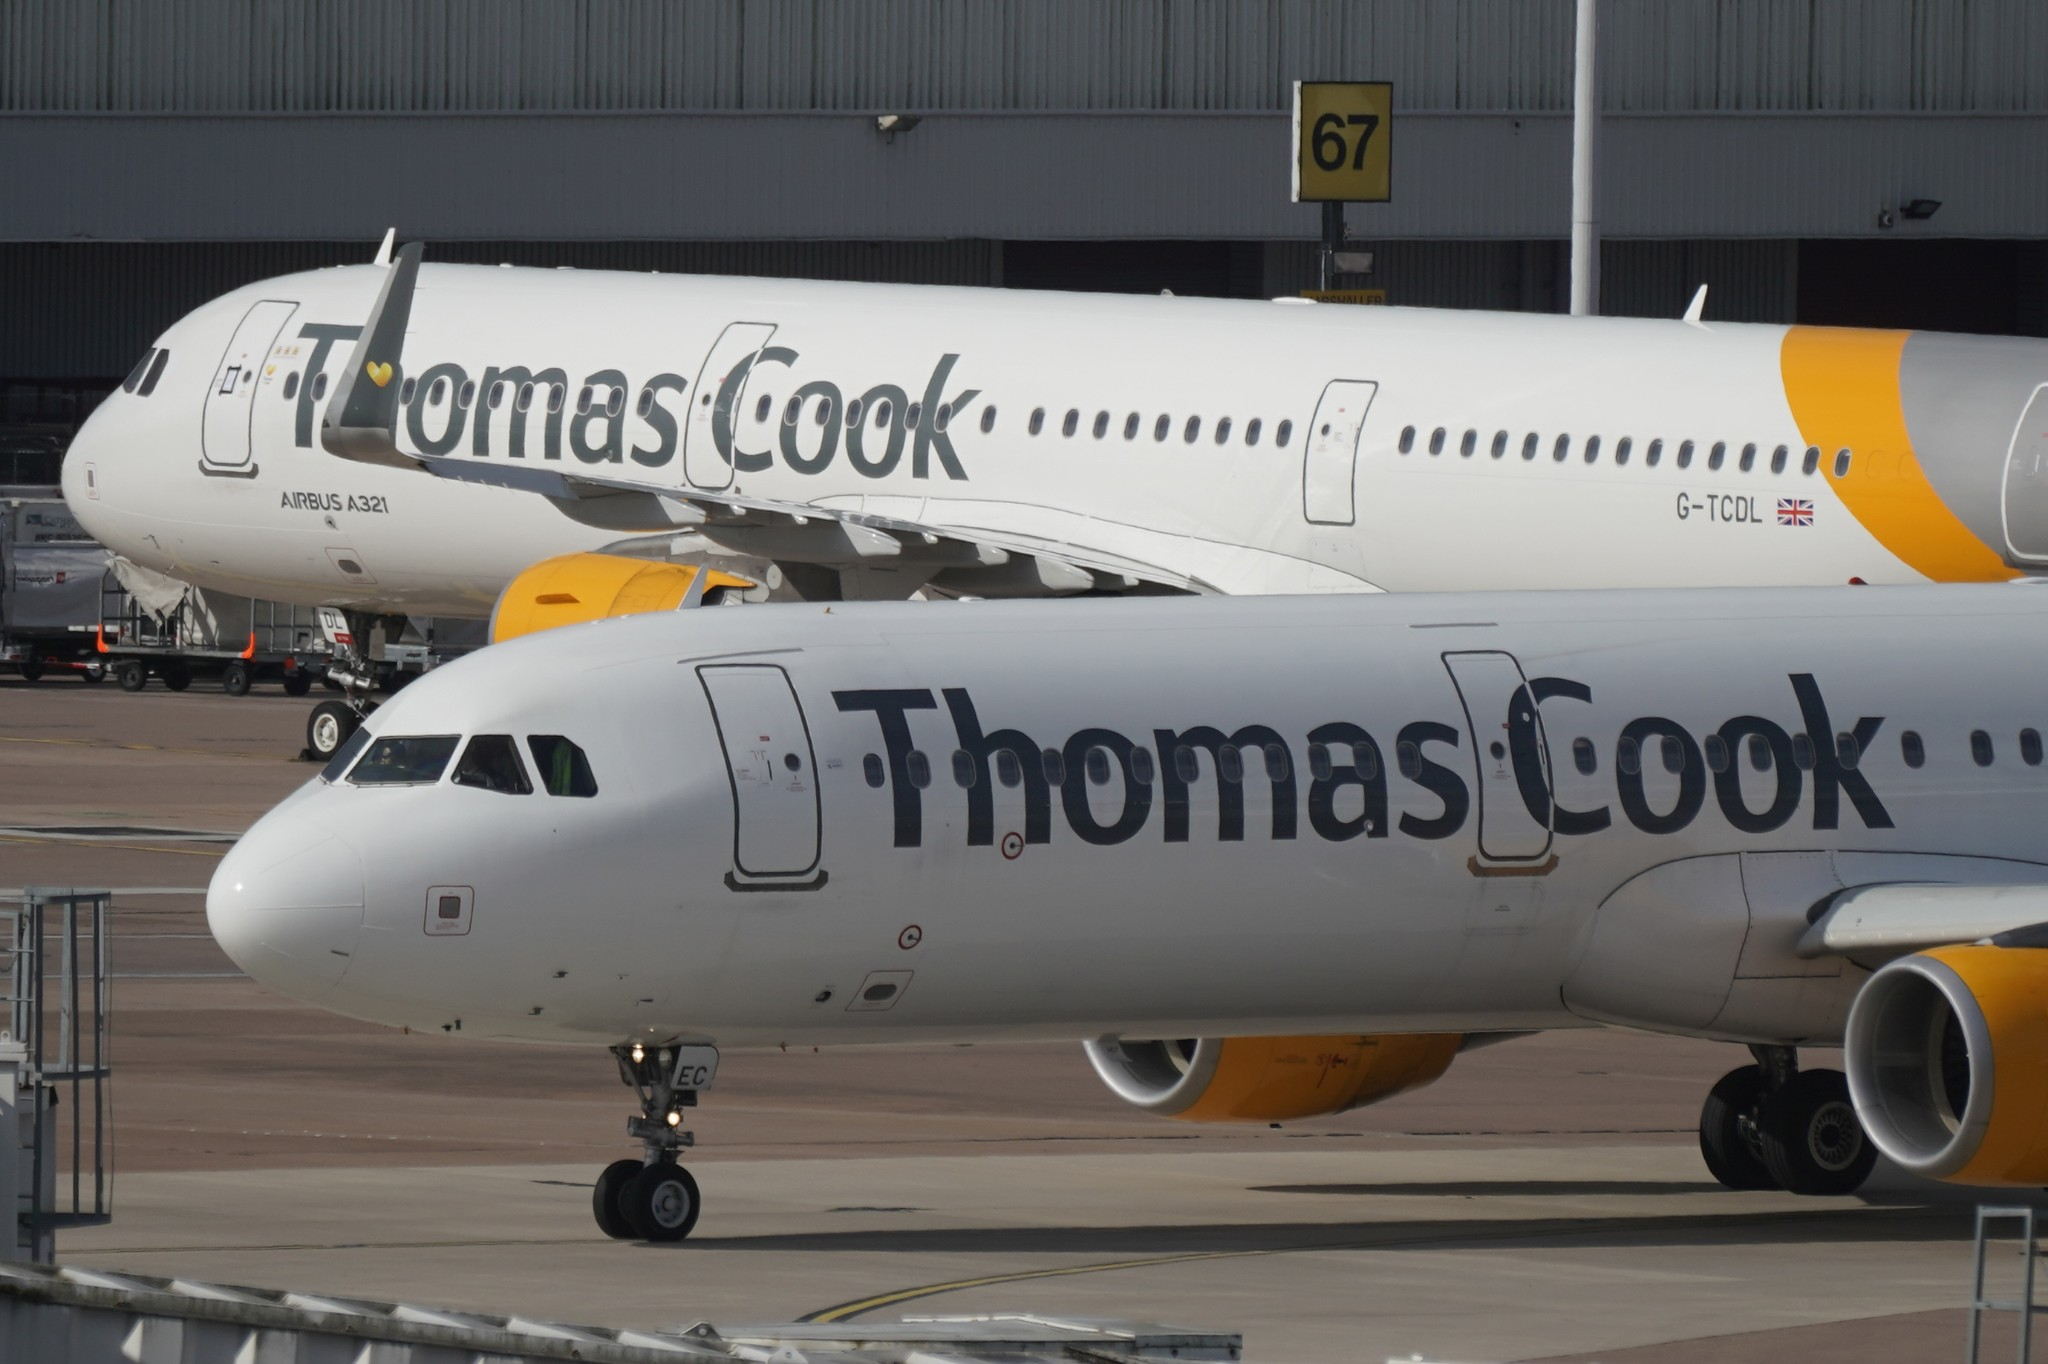 Thomas Cook: The End of an Era